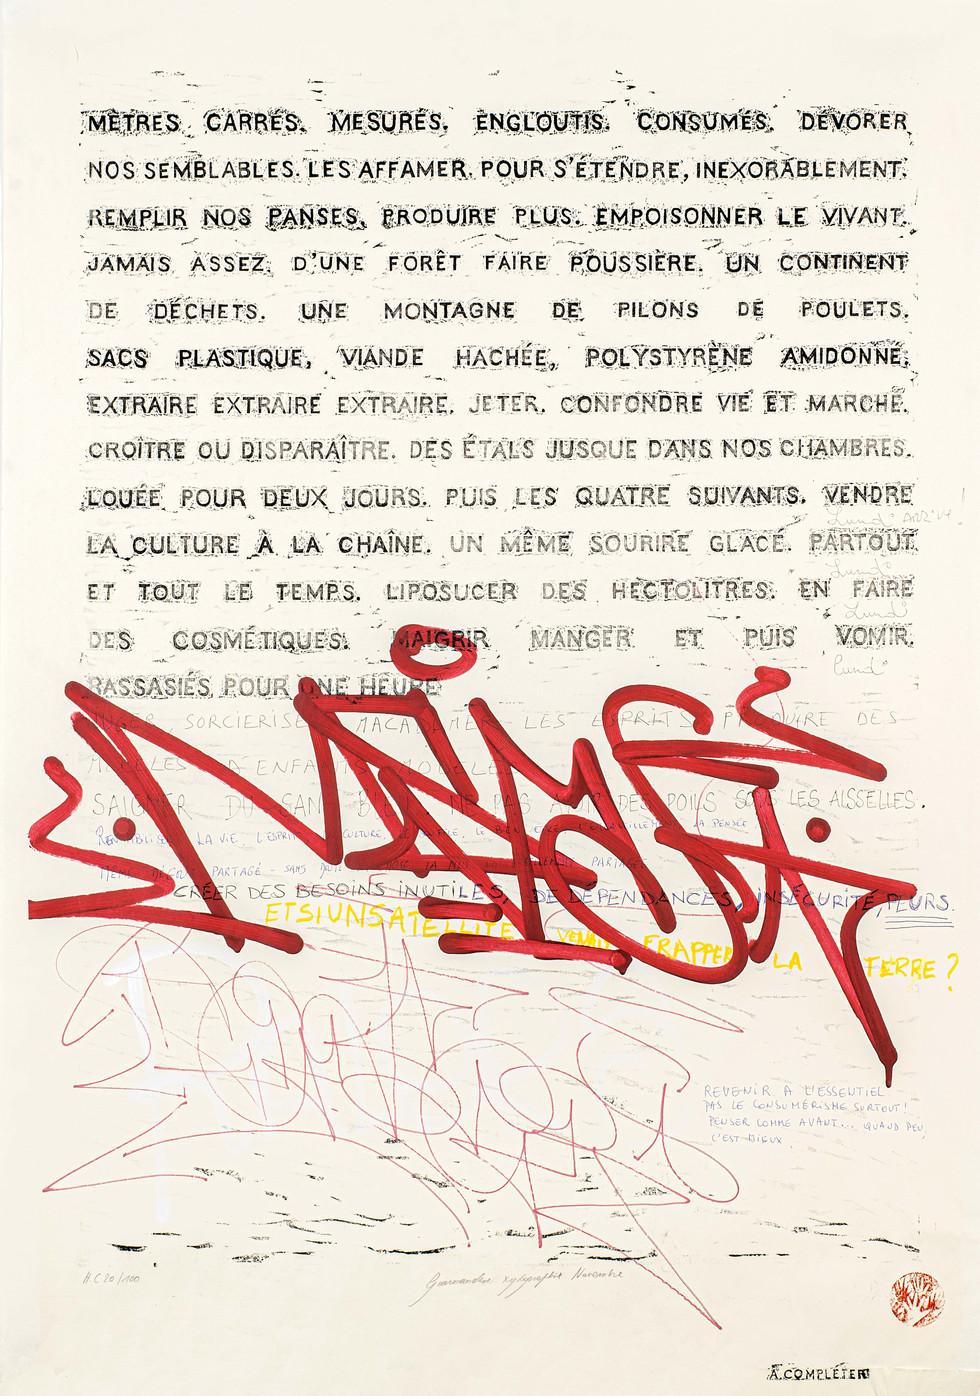 Gourmandise II, 56-100, xylographie, 70 x 100 cm, 2019